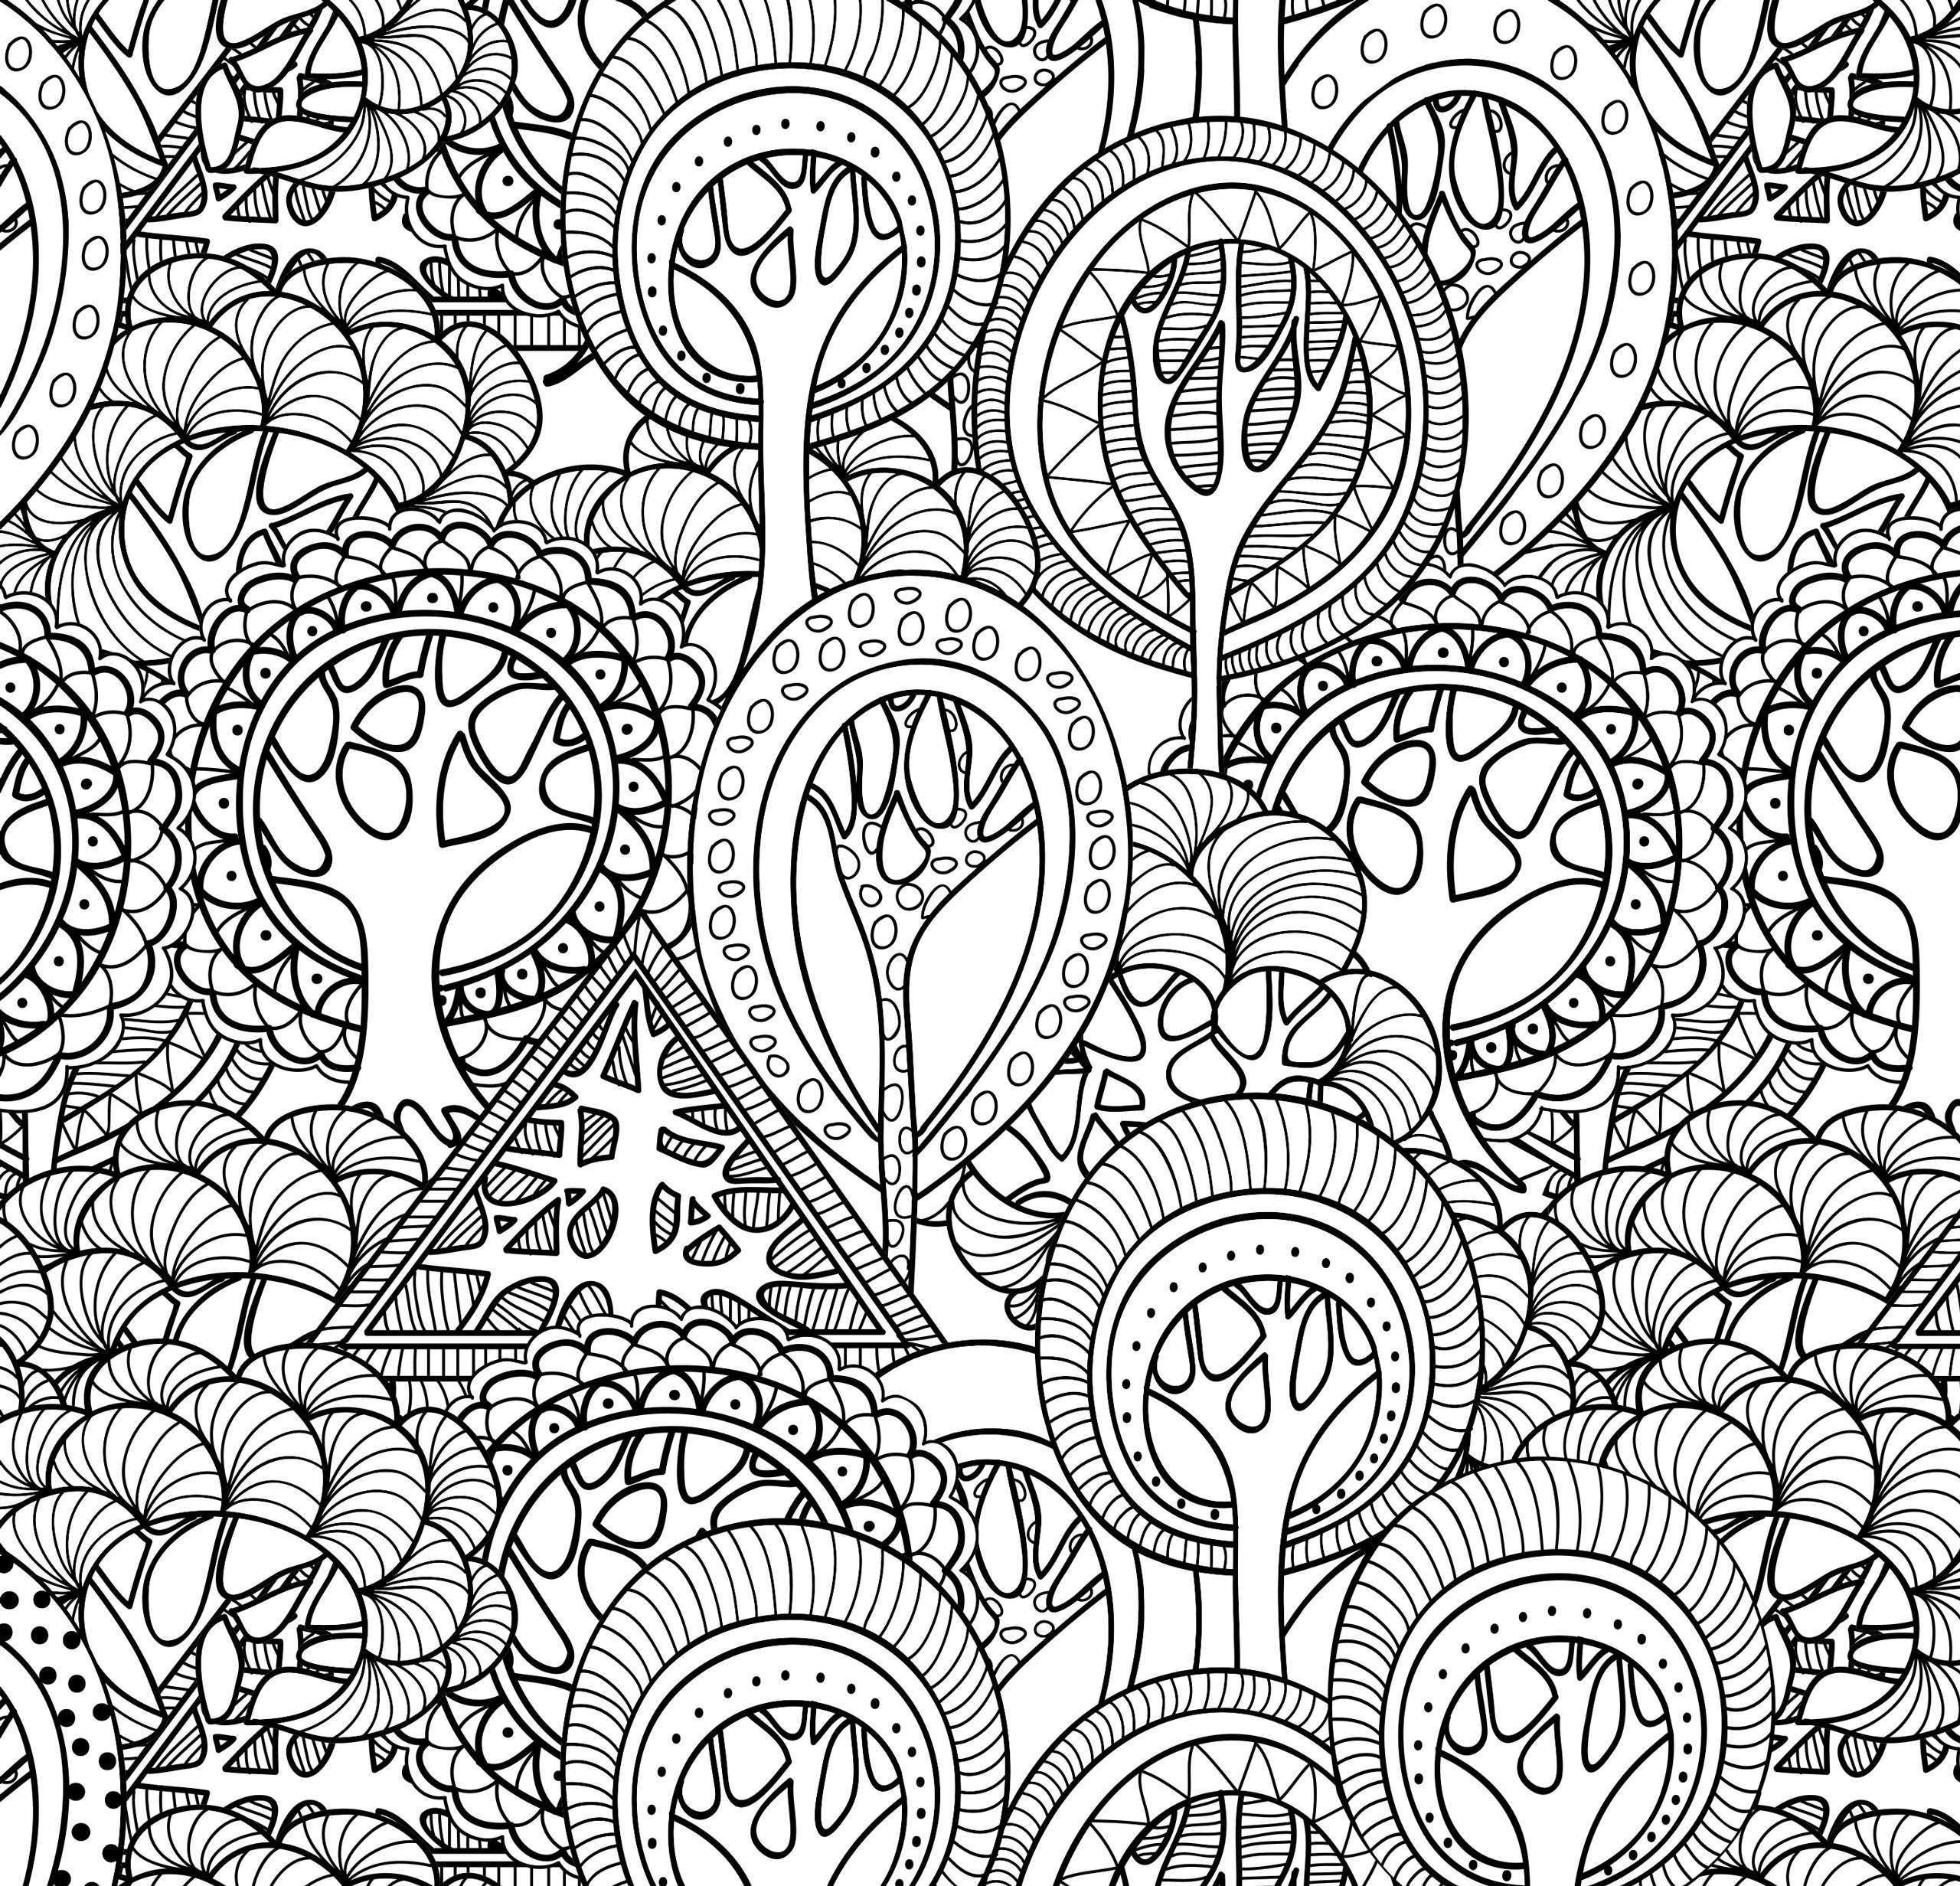 complicated coloring sheets free printable complicated coloring pages online coloring complicated sheets